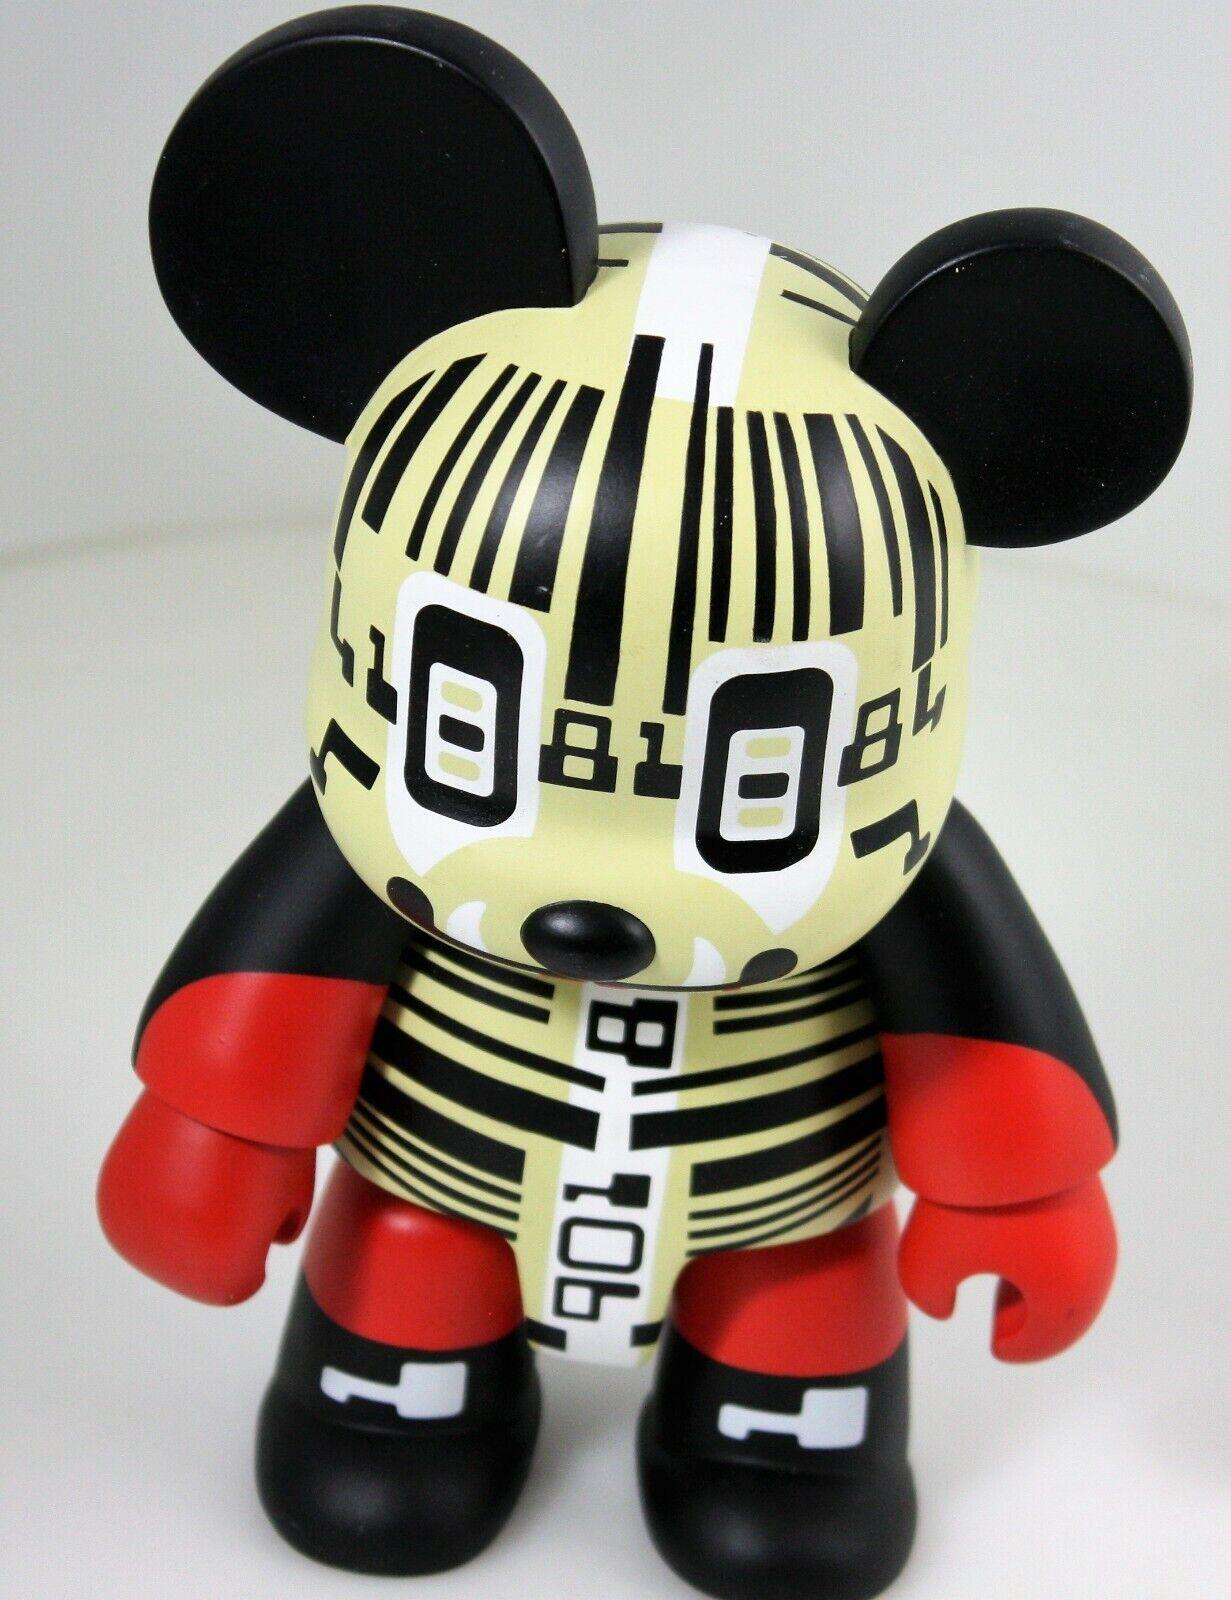 Qee orsoorsoQ Oxop Series CSA  Barcode orso giocattolo2R 2004  risparmia fino al 50%